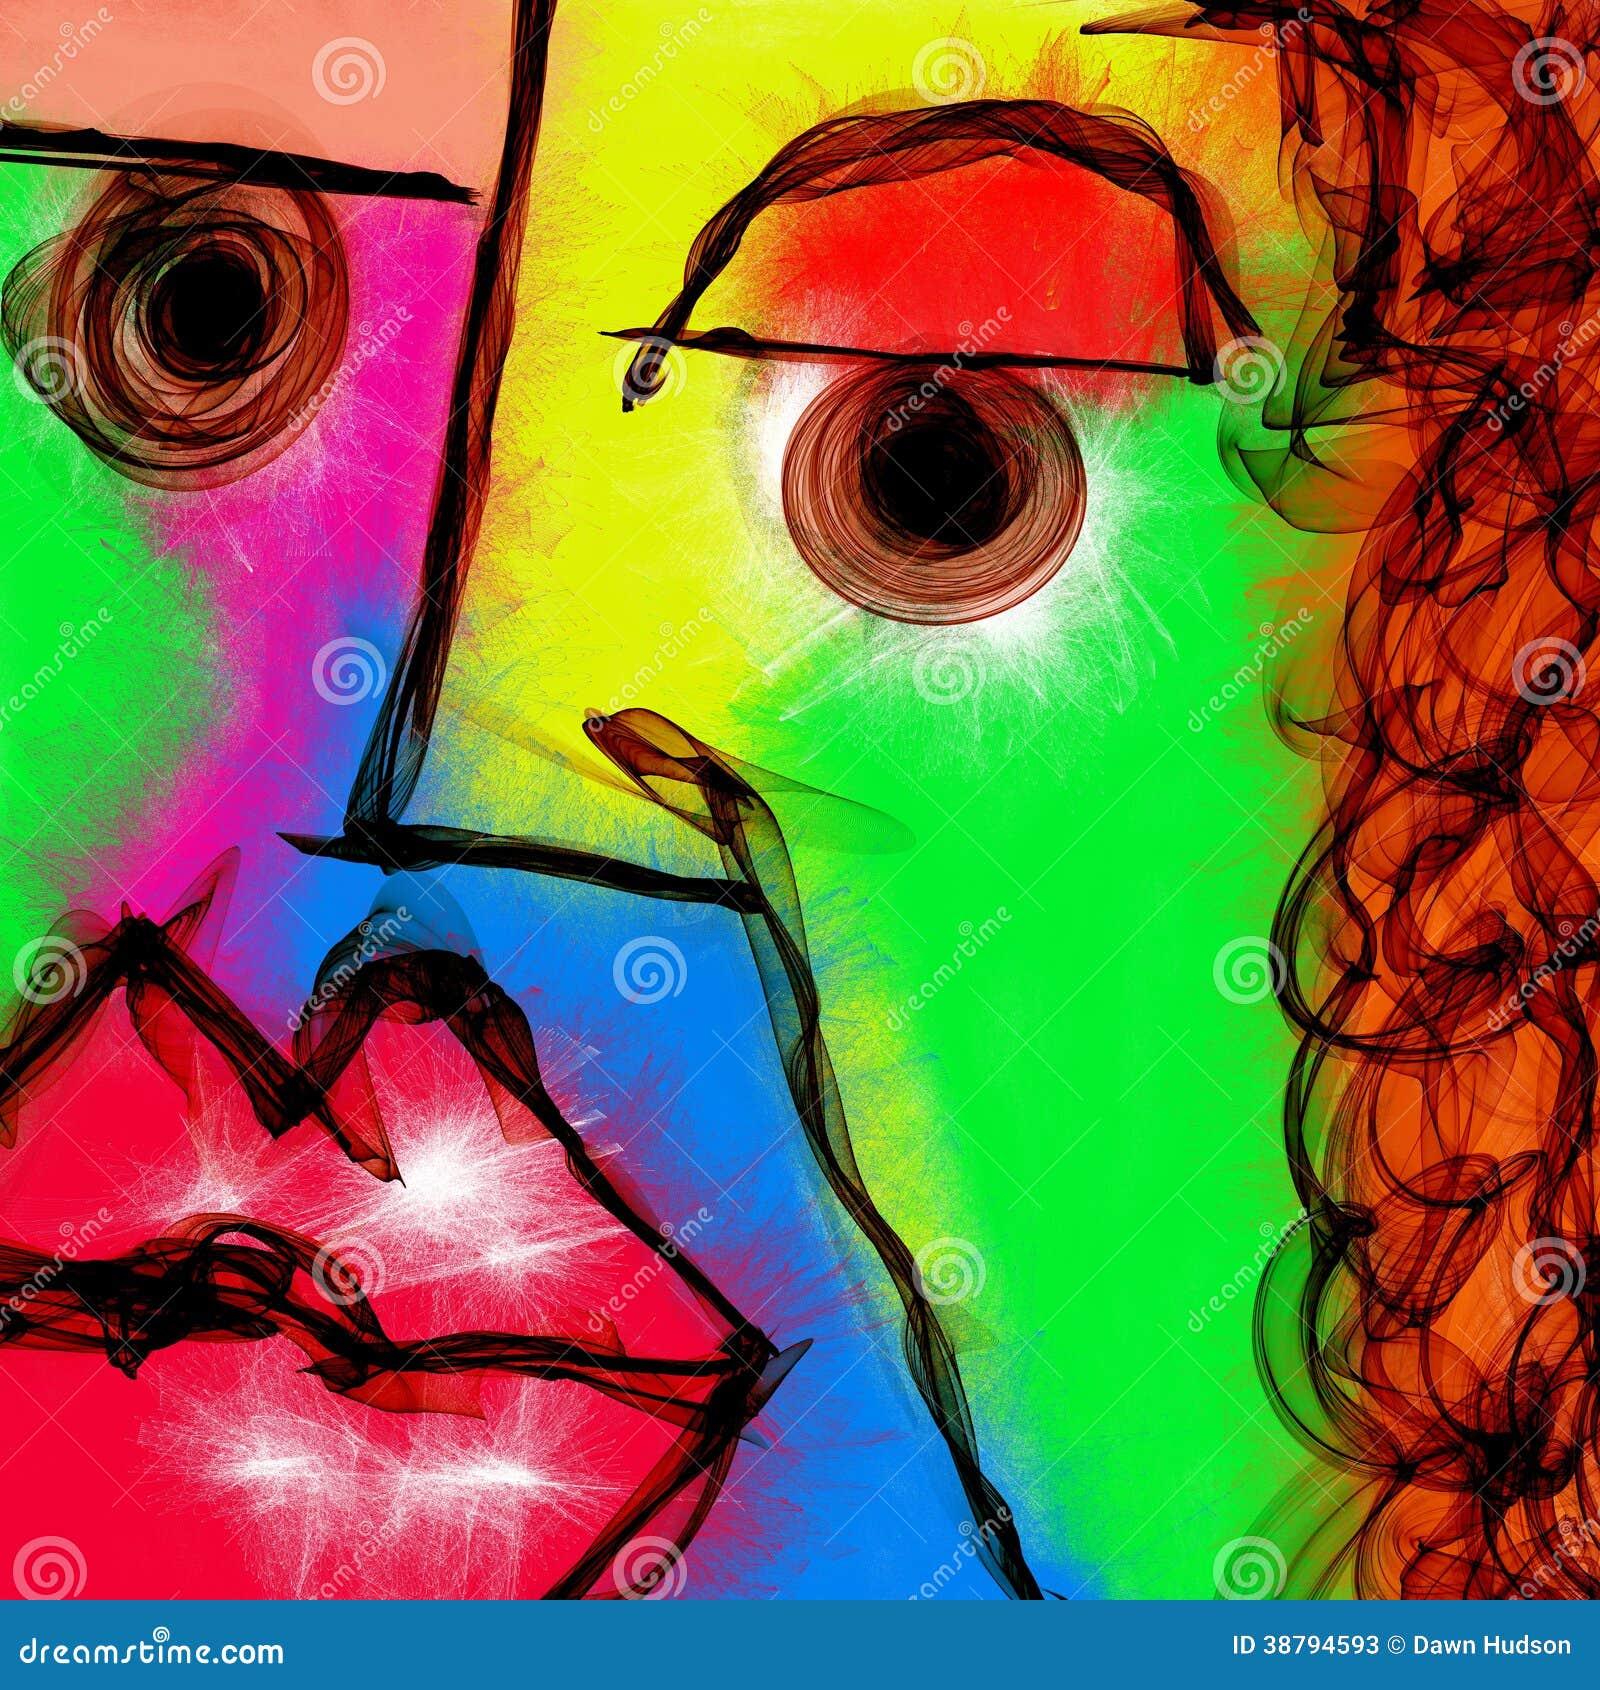 Extrêmement Peinture Abstraite De Visage Illustration Stock - Image: 38794593 XA23